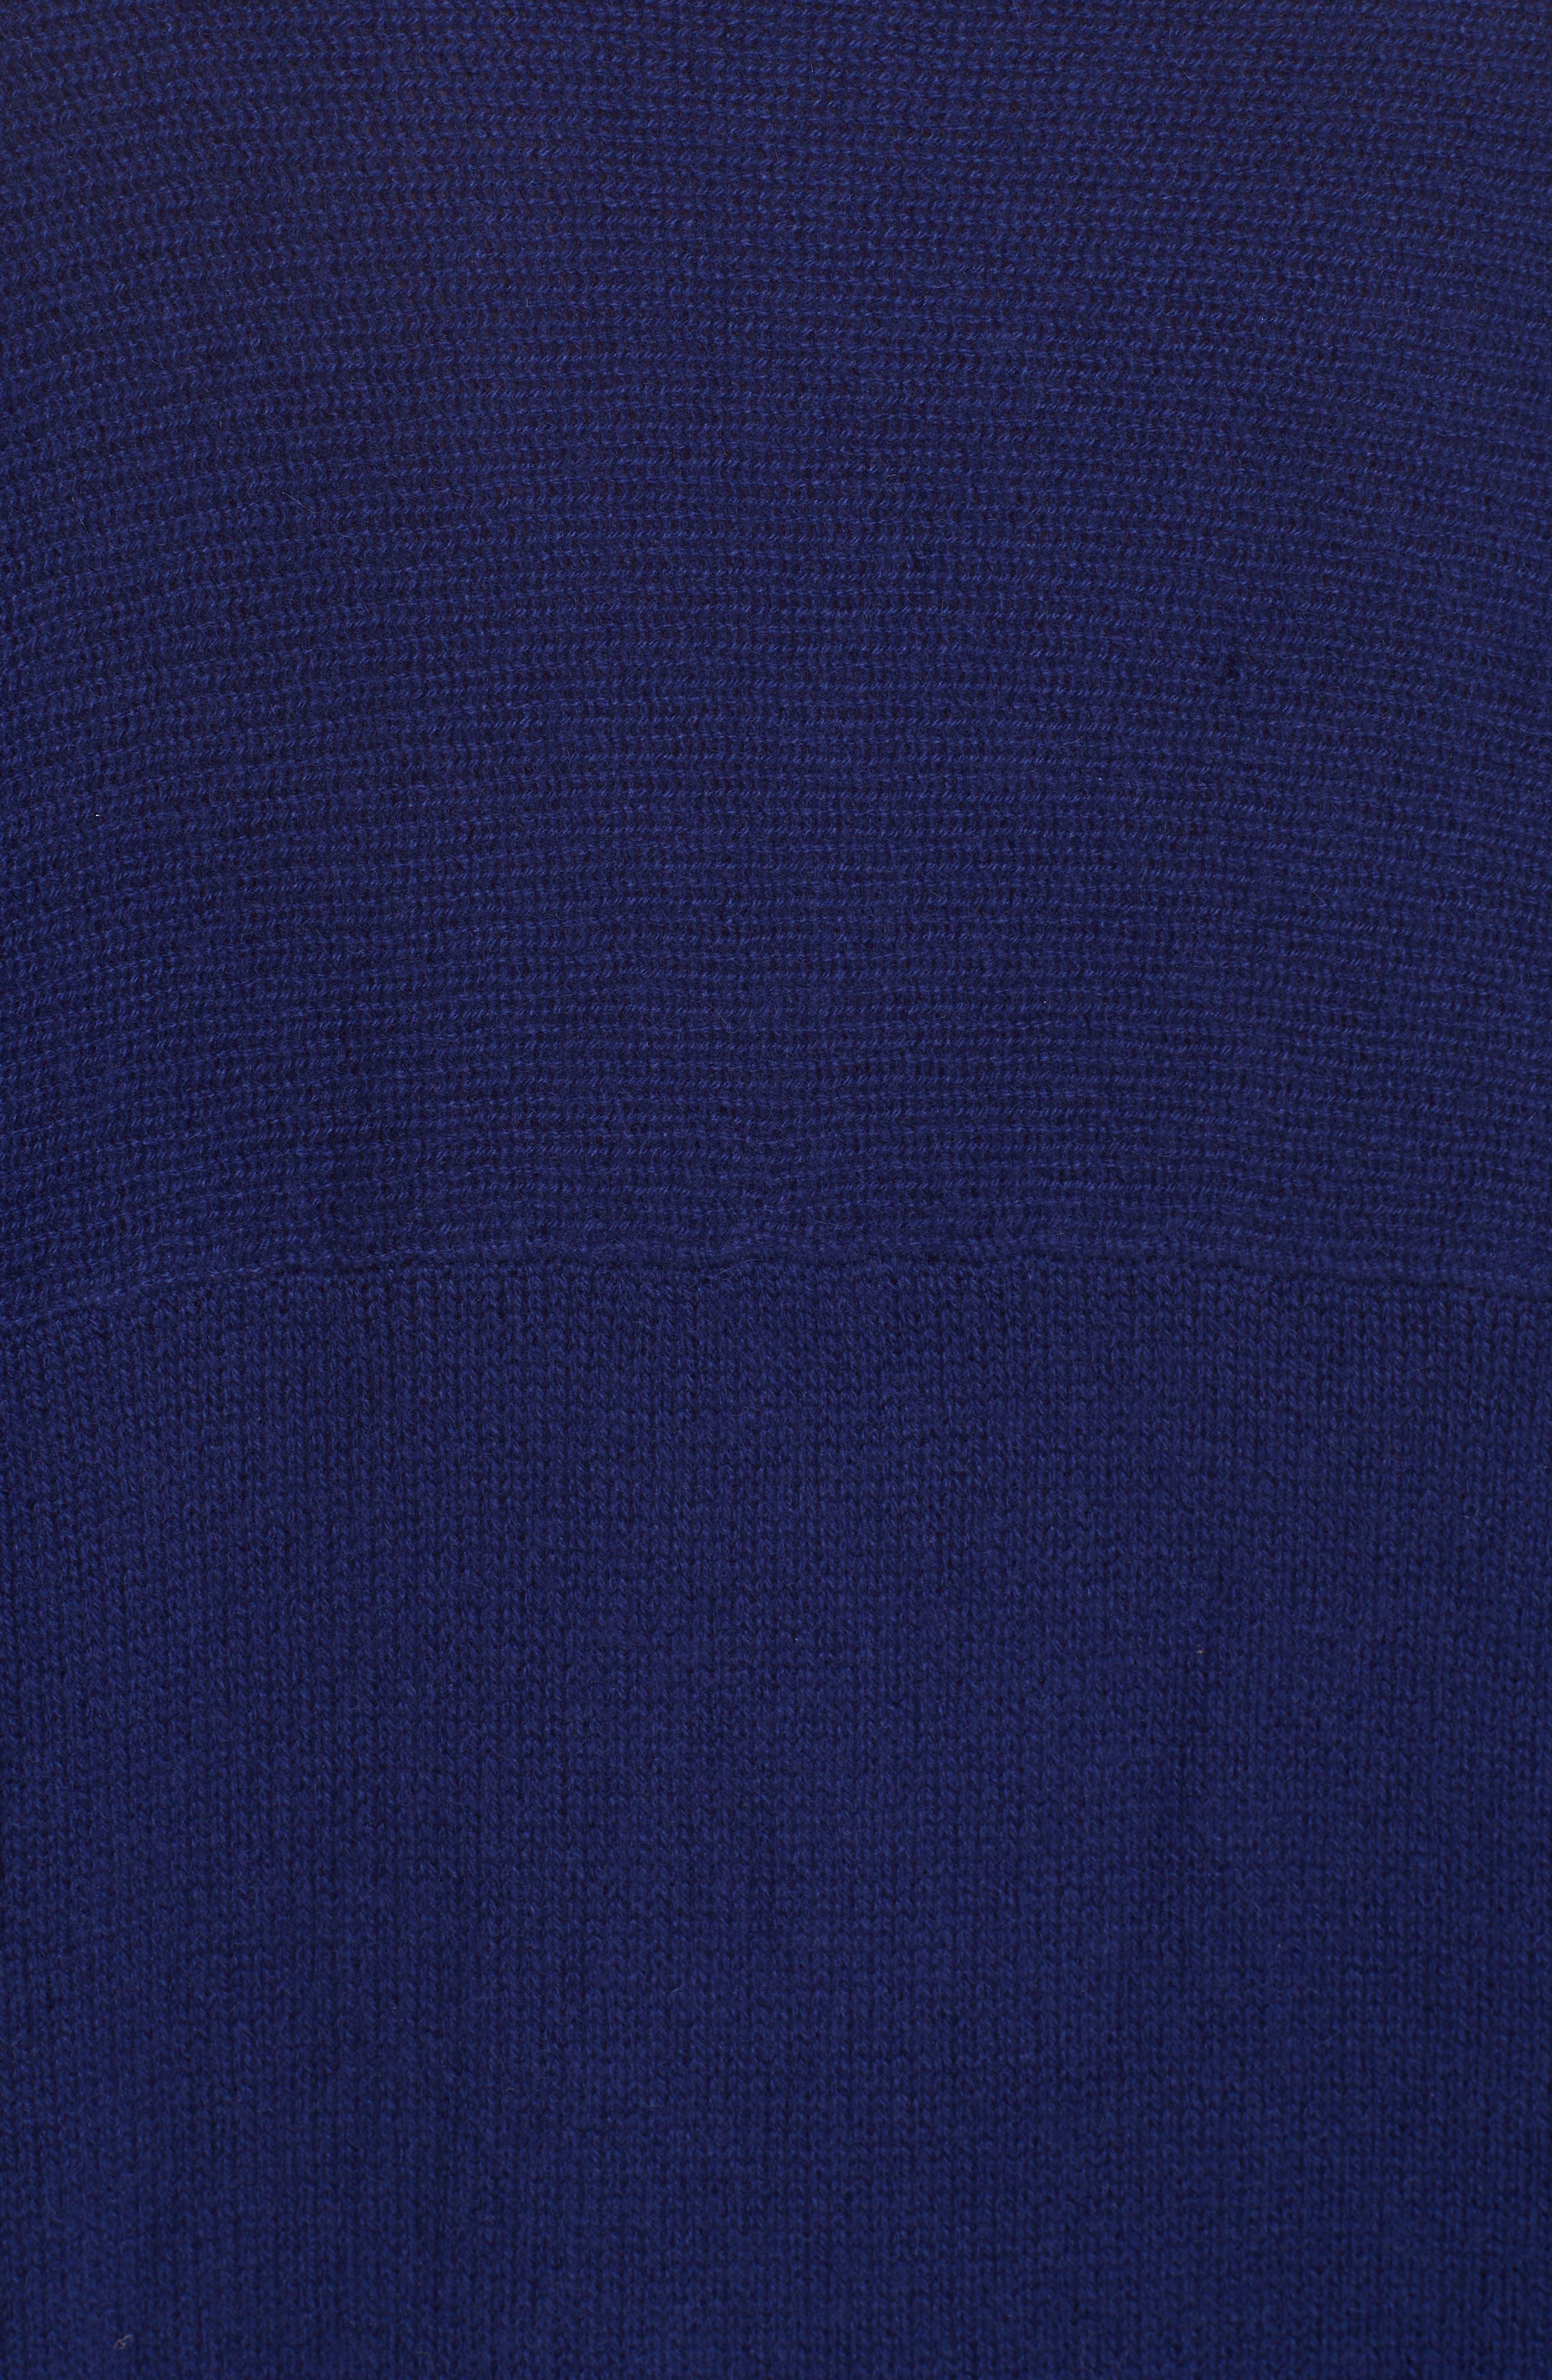 Cashmere Sweater,                             Alternate thumbnail 5, color,                             PERSIAN BLUE